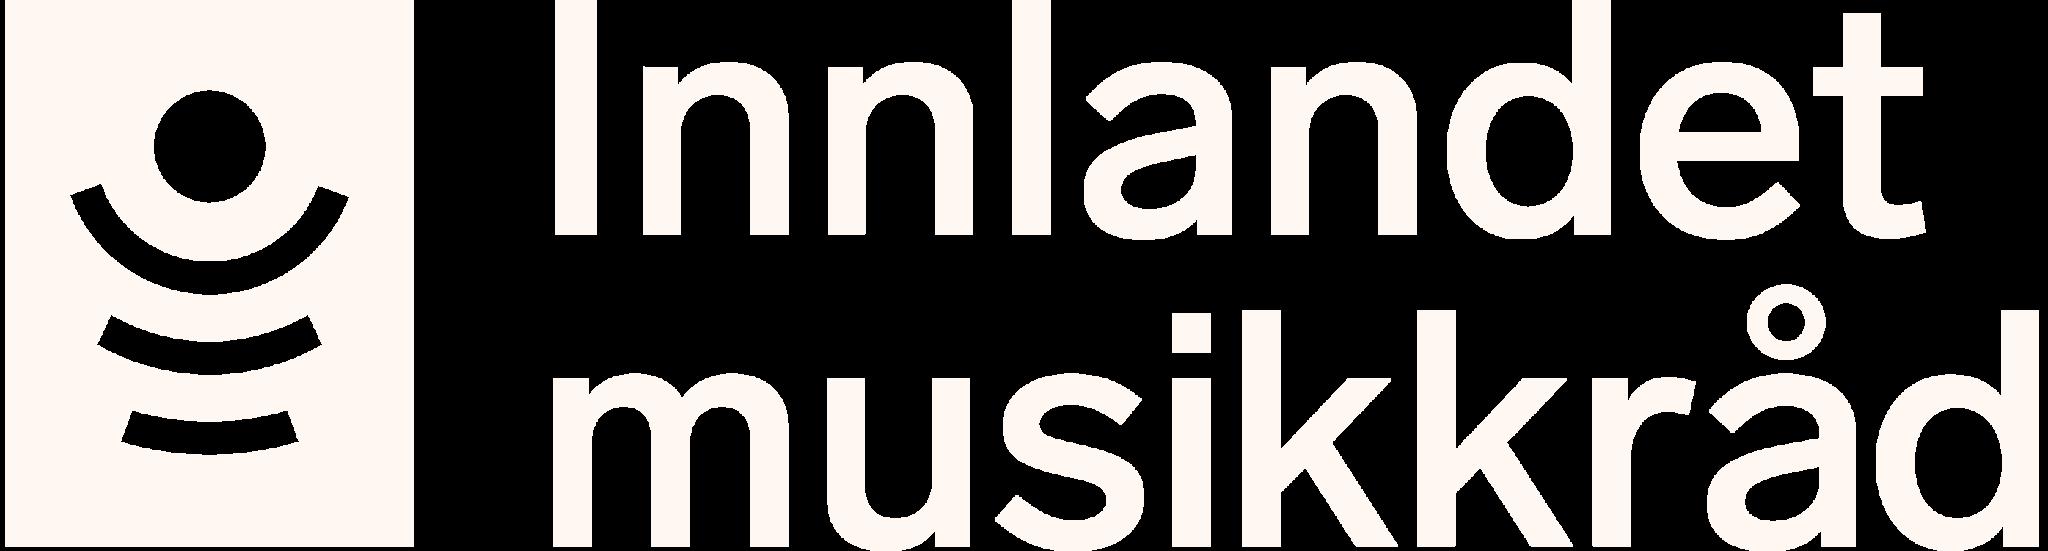 Innlandet musikkråd